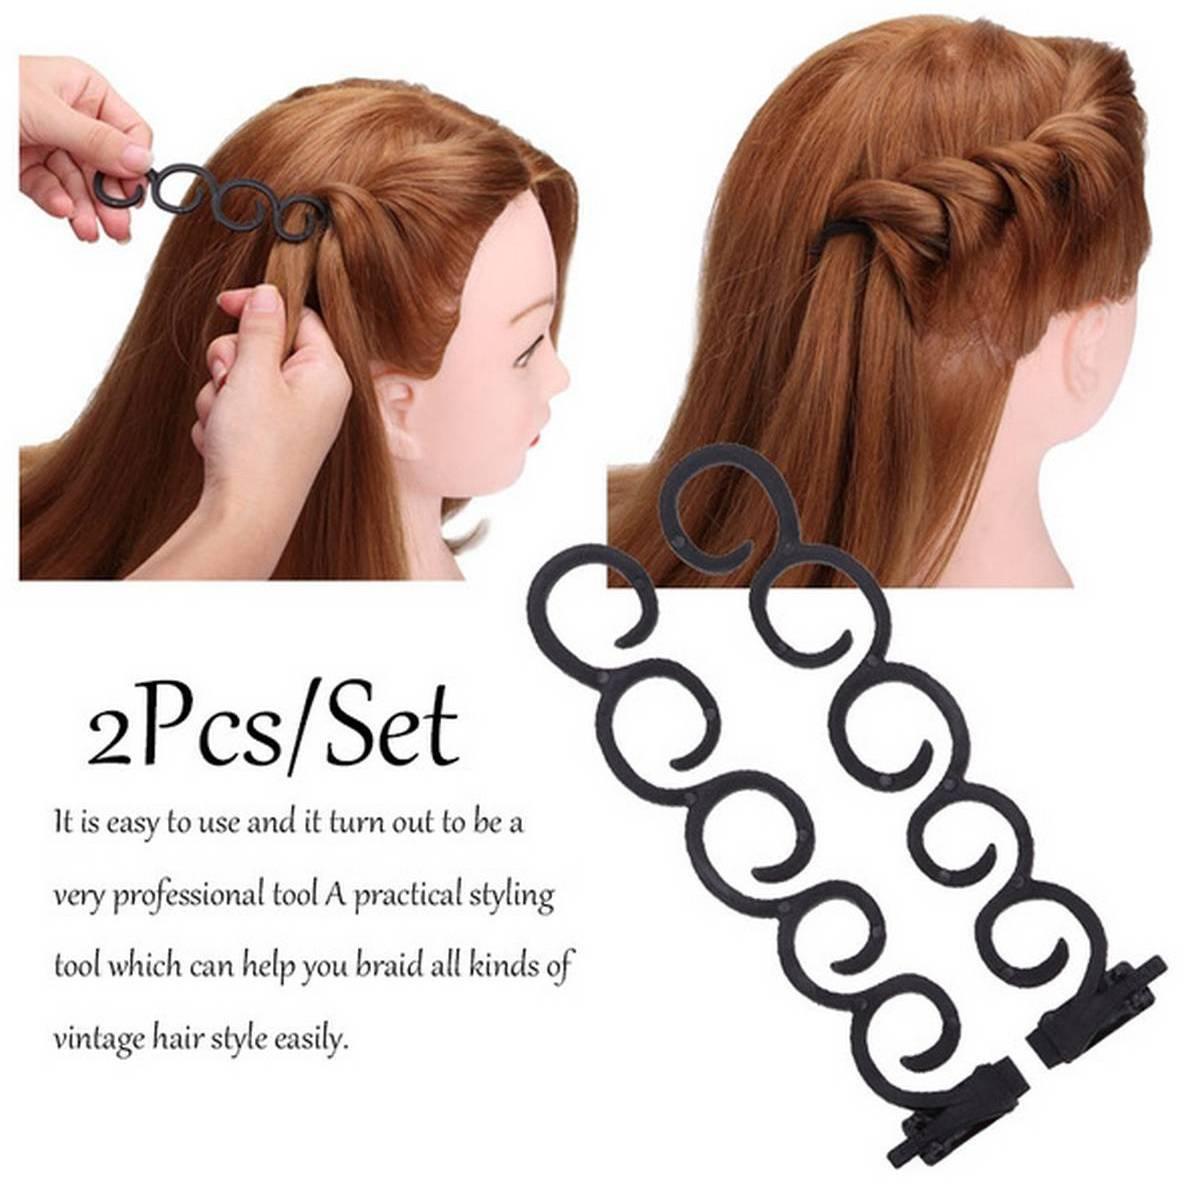 M MISM 2pcs/set 13.5cm/5.3inch Hair styles maker Tress Tool Magic Hair Accessories DIY Hair disk easy simple For Women Girls